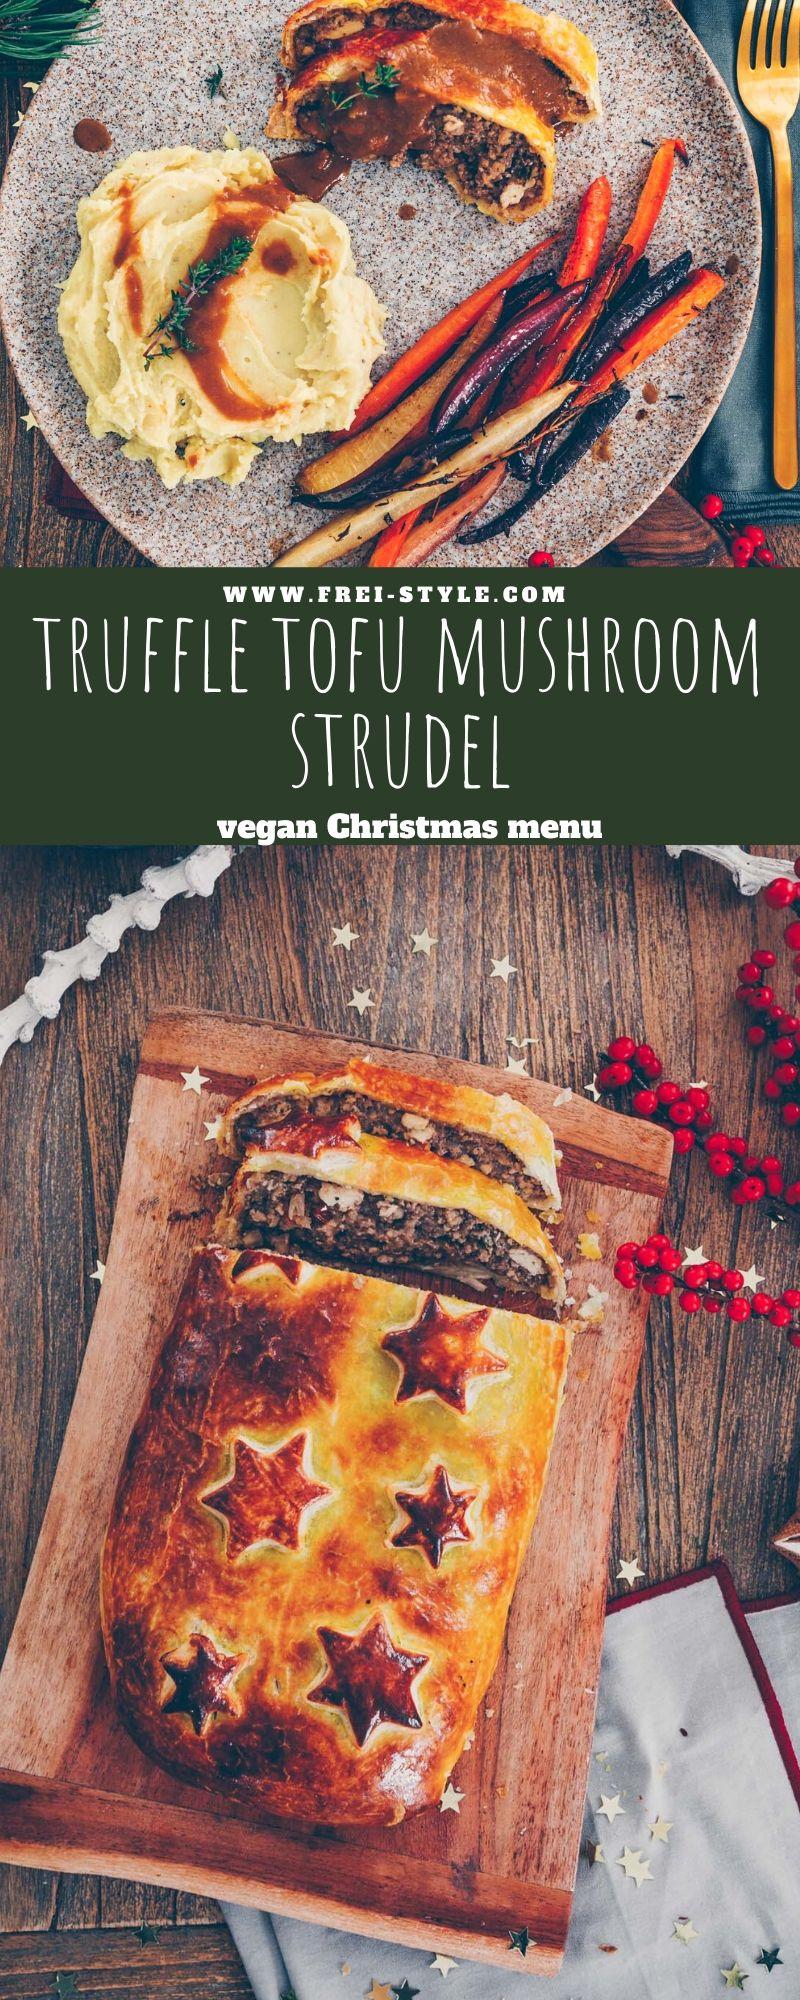 Christmas menu: Truffle tofu mushroom chestnut strudel